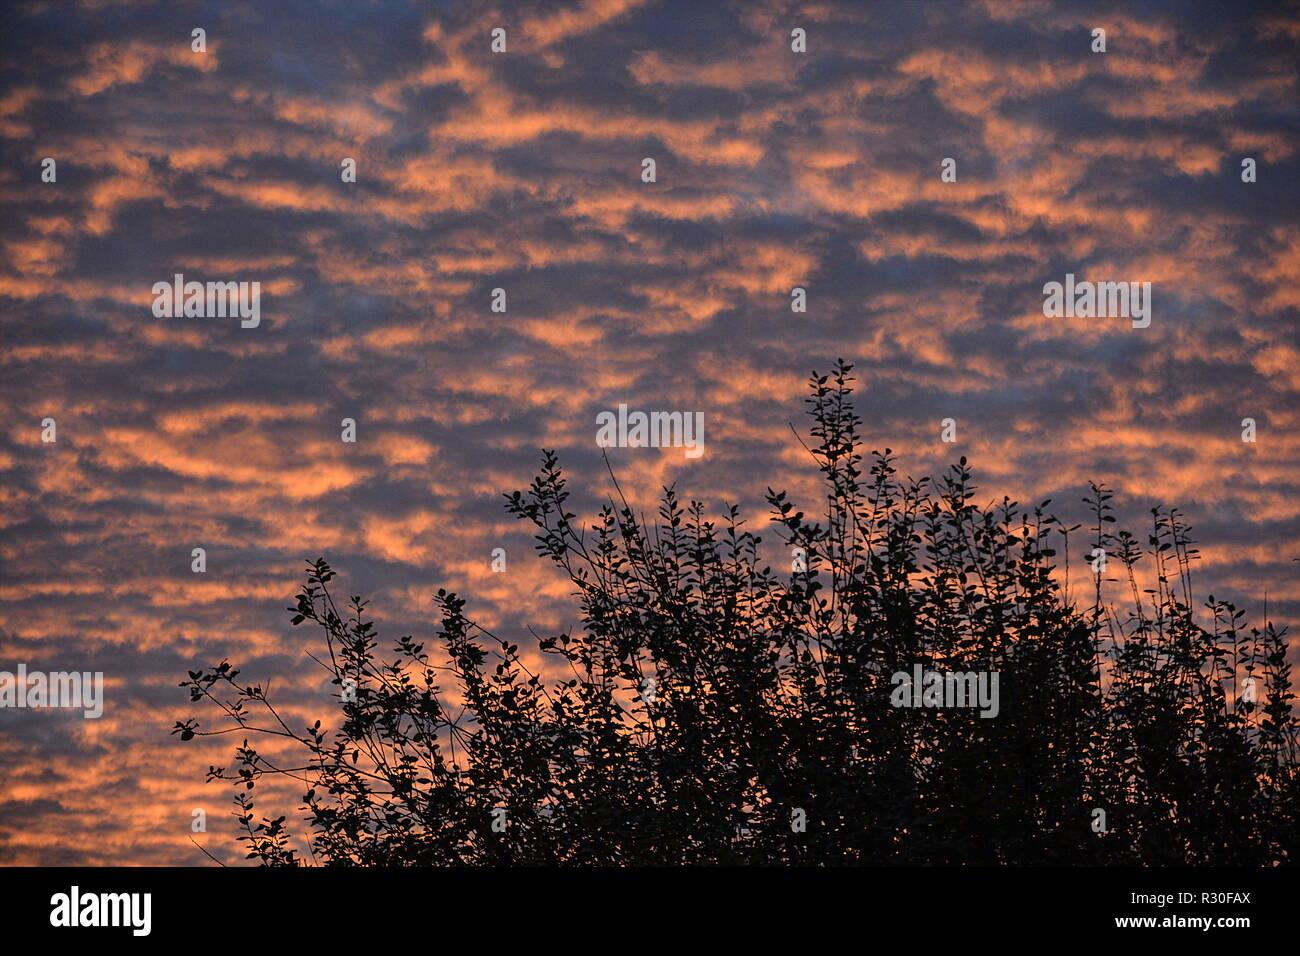 Sonnenaufgang Hintergrund Abendrot - Stock Image